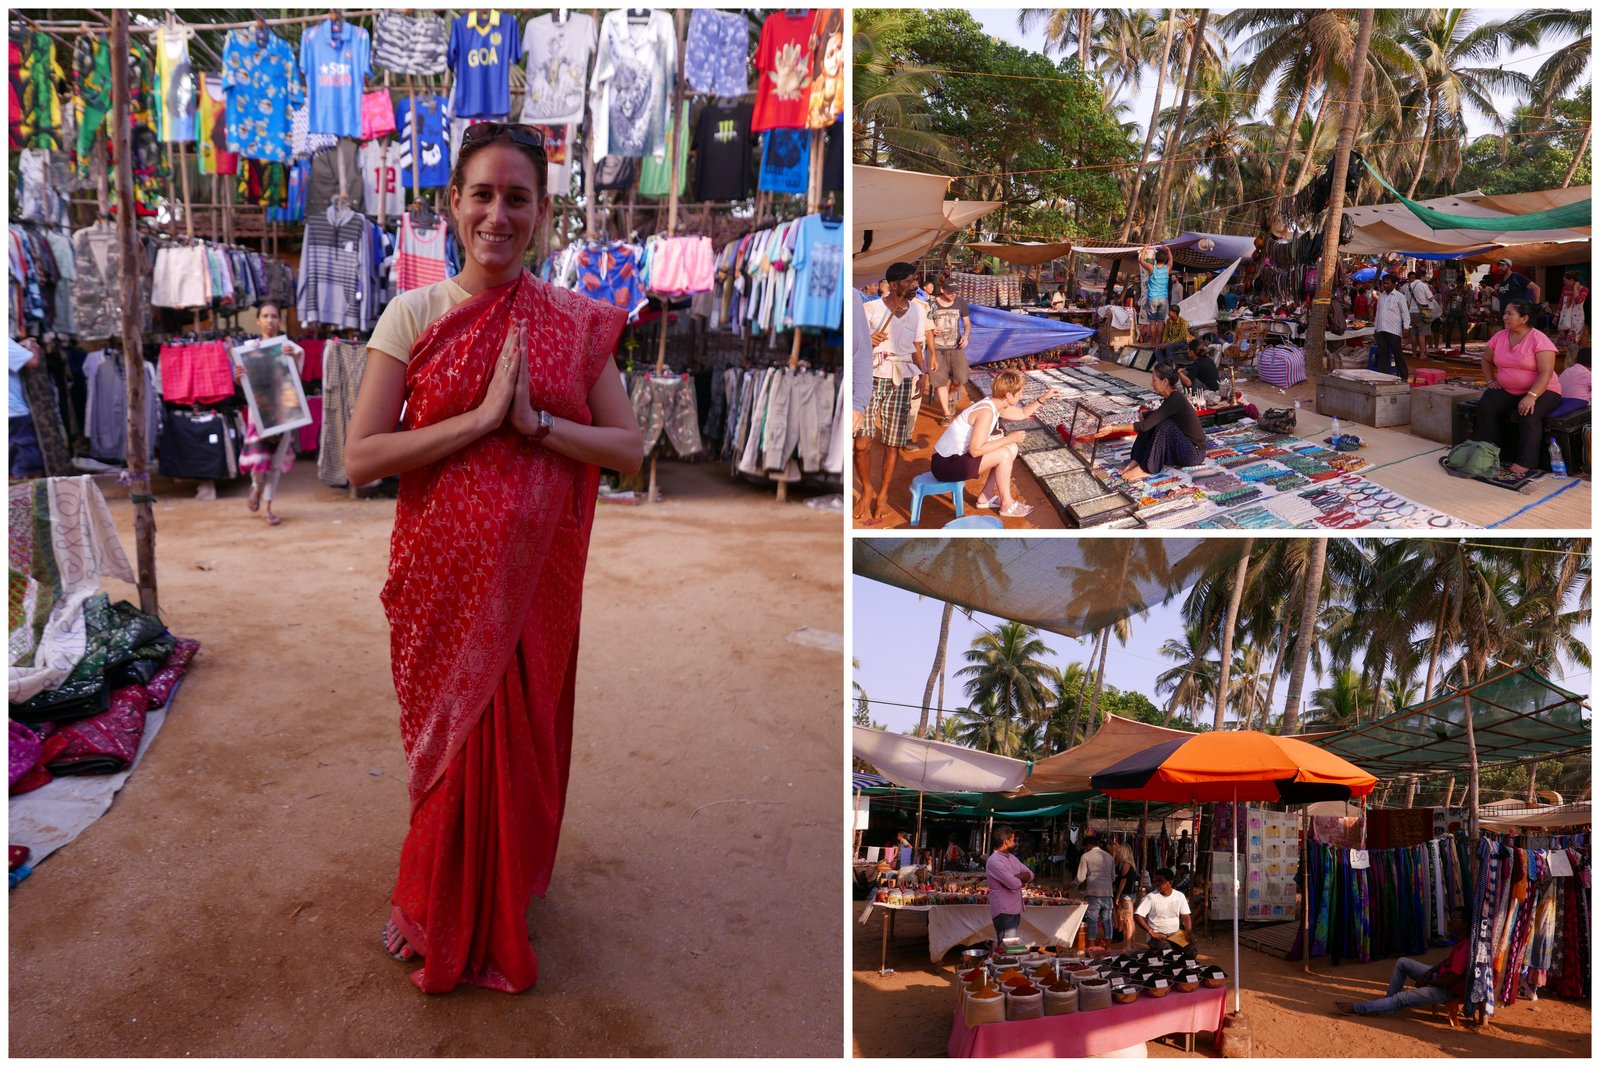 Le marché du mercredi d'Anjuna